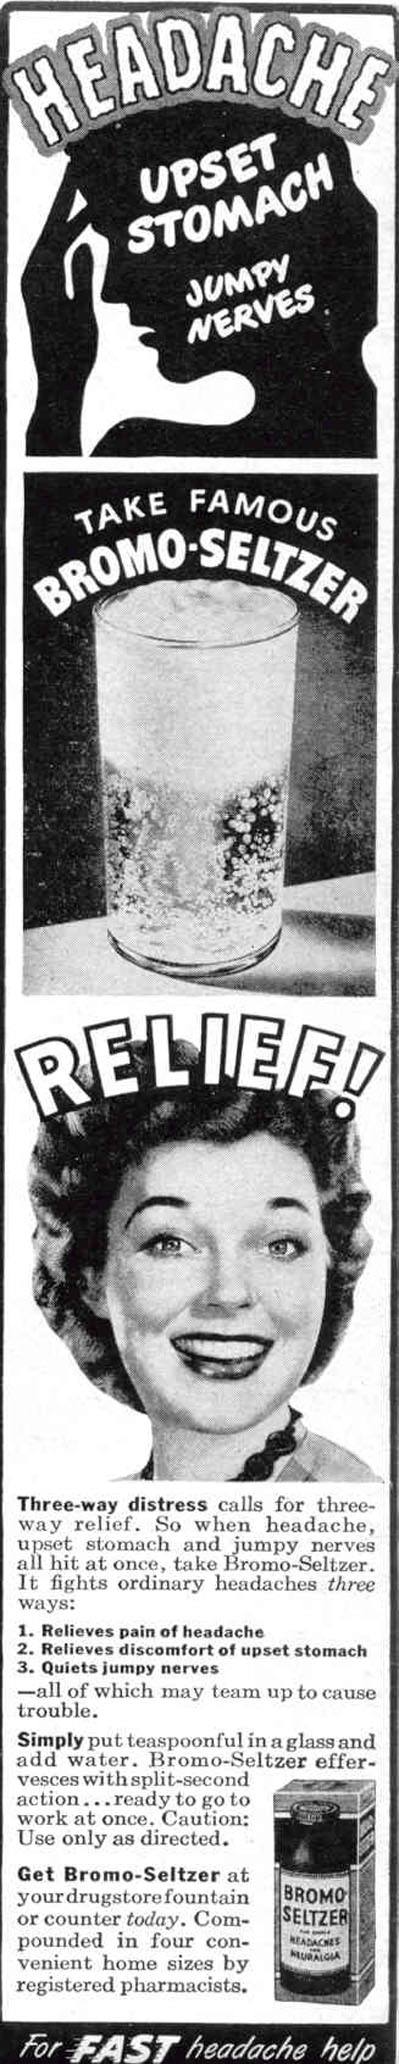 BROMO-SELTZER LIFE 10/27/1947 p. 14